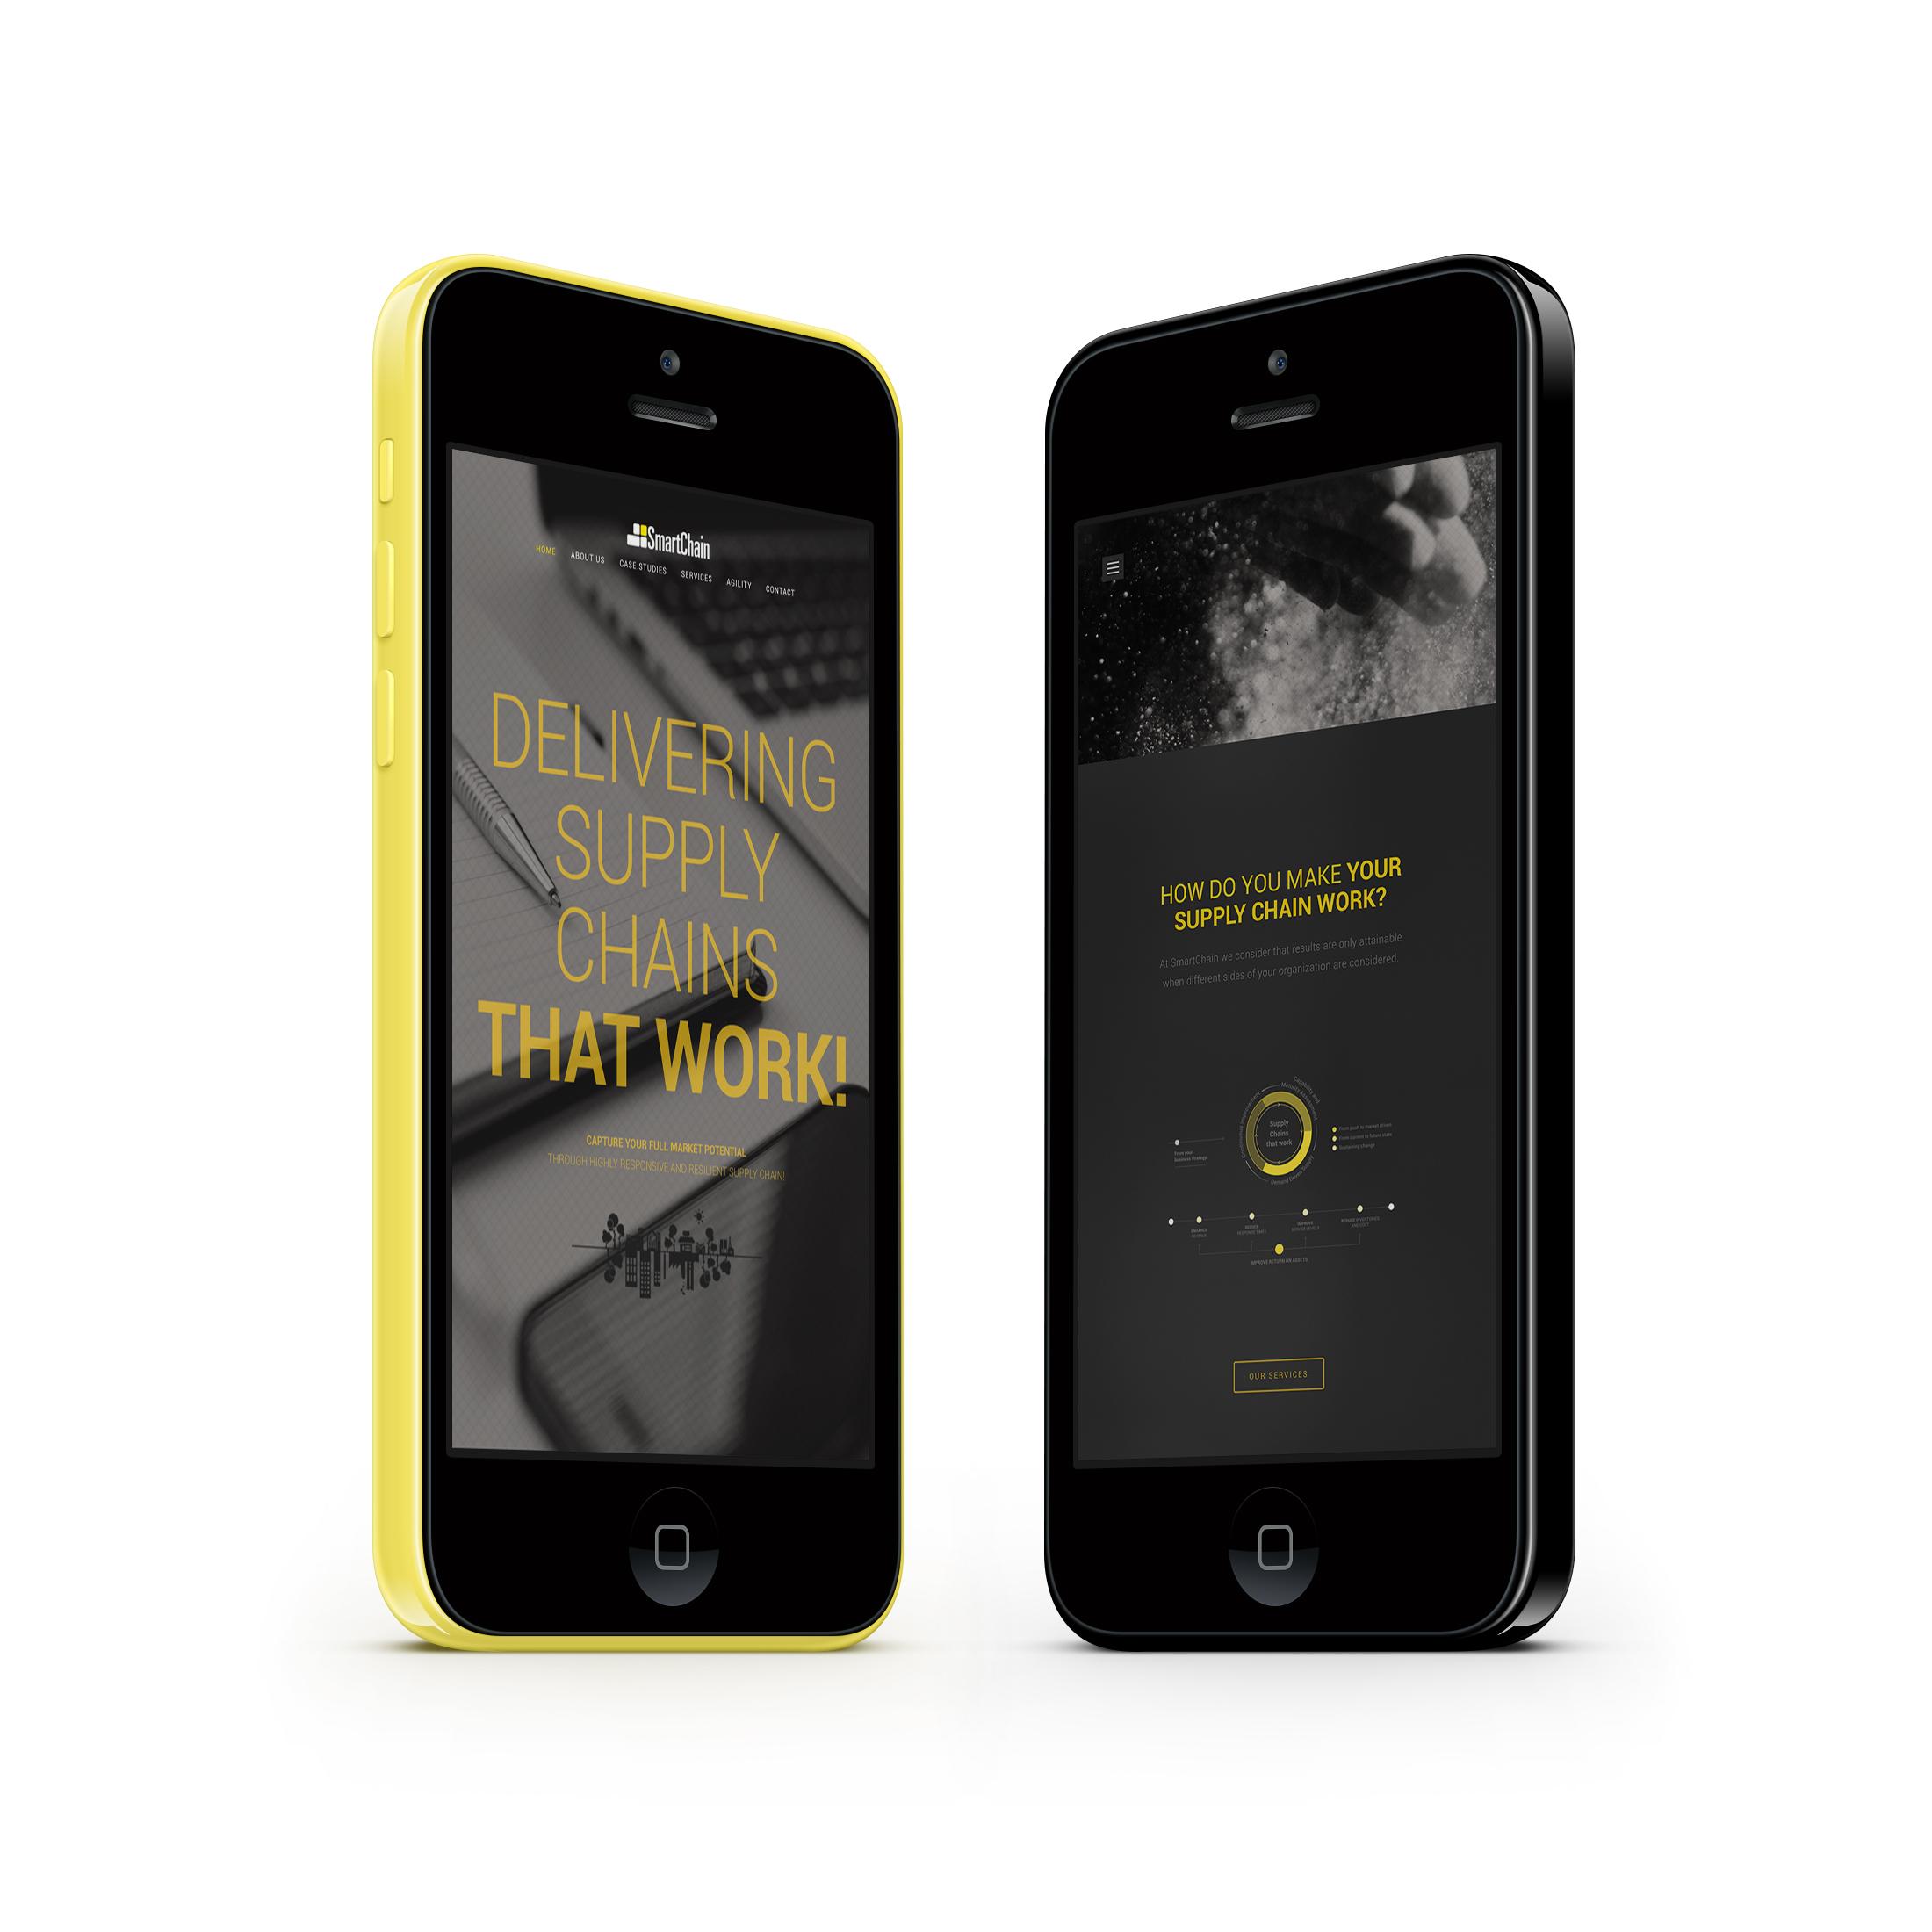 Smartchain Website Webdesign Graphic Design I Phone Developed bonjourmolotov 08.jpg